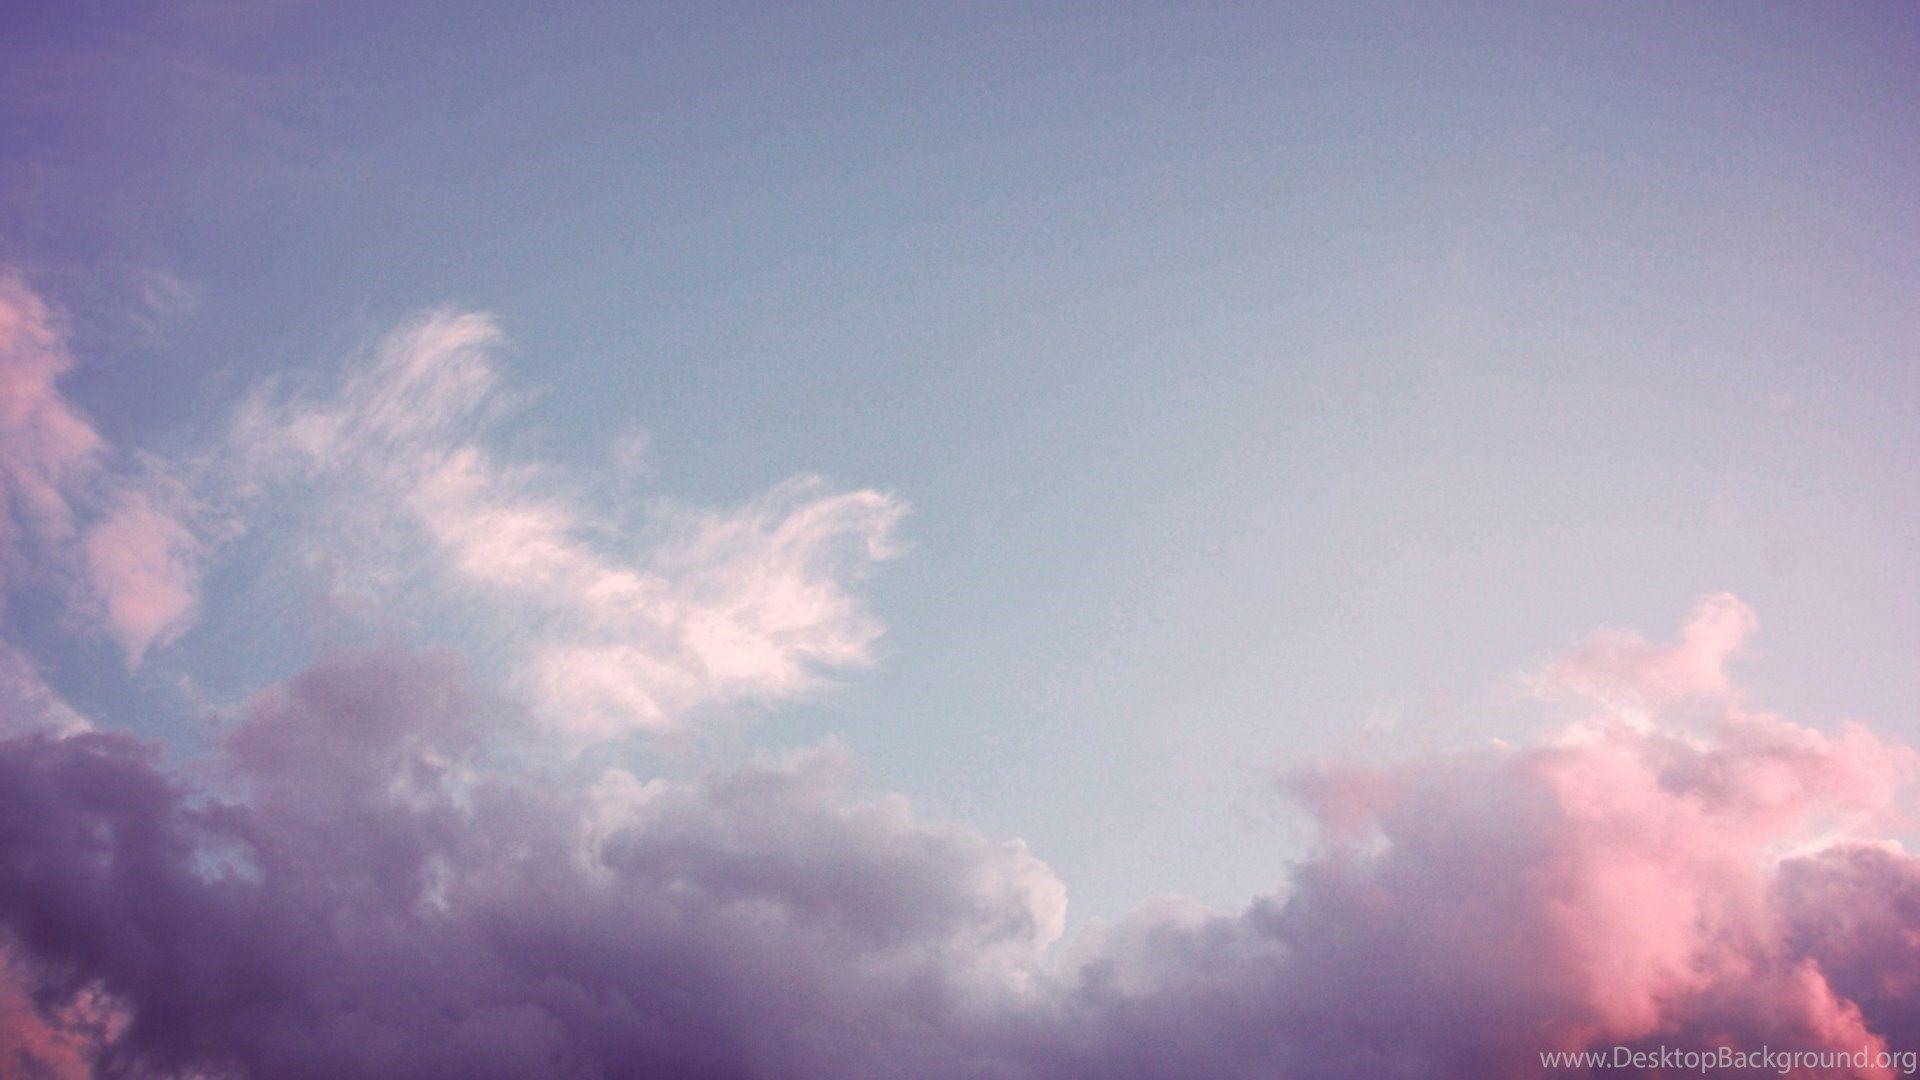 Sky Desktop Background Posted By Ryan Sellers